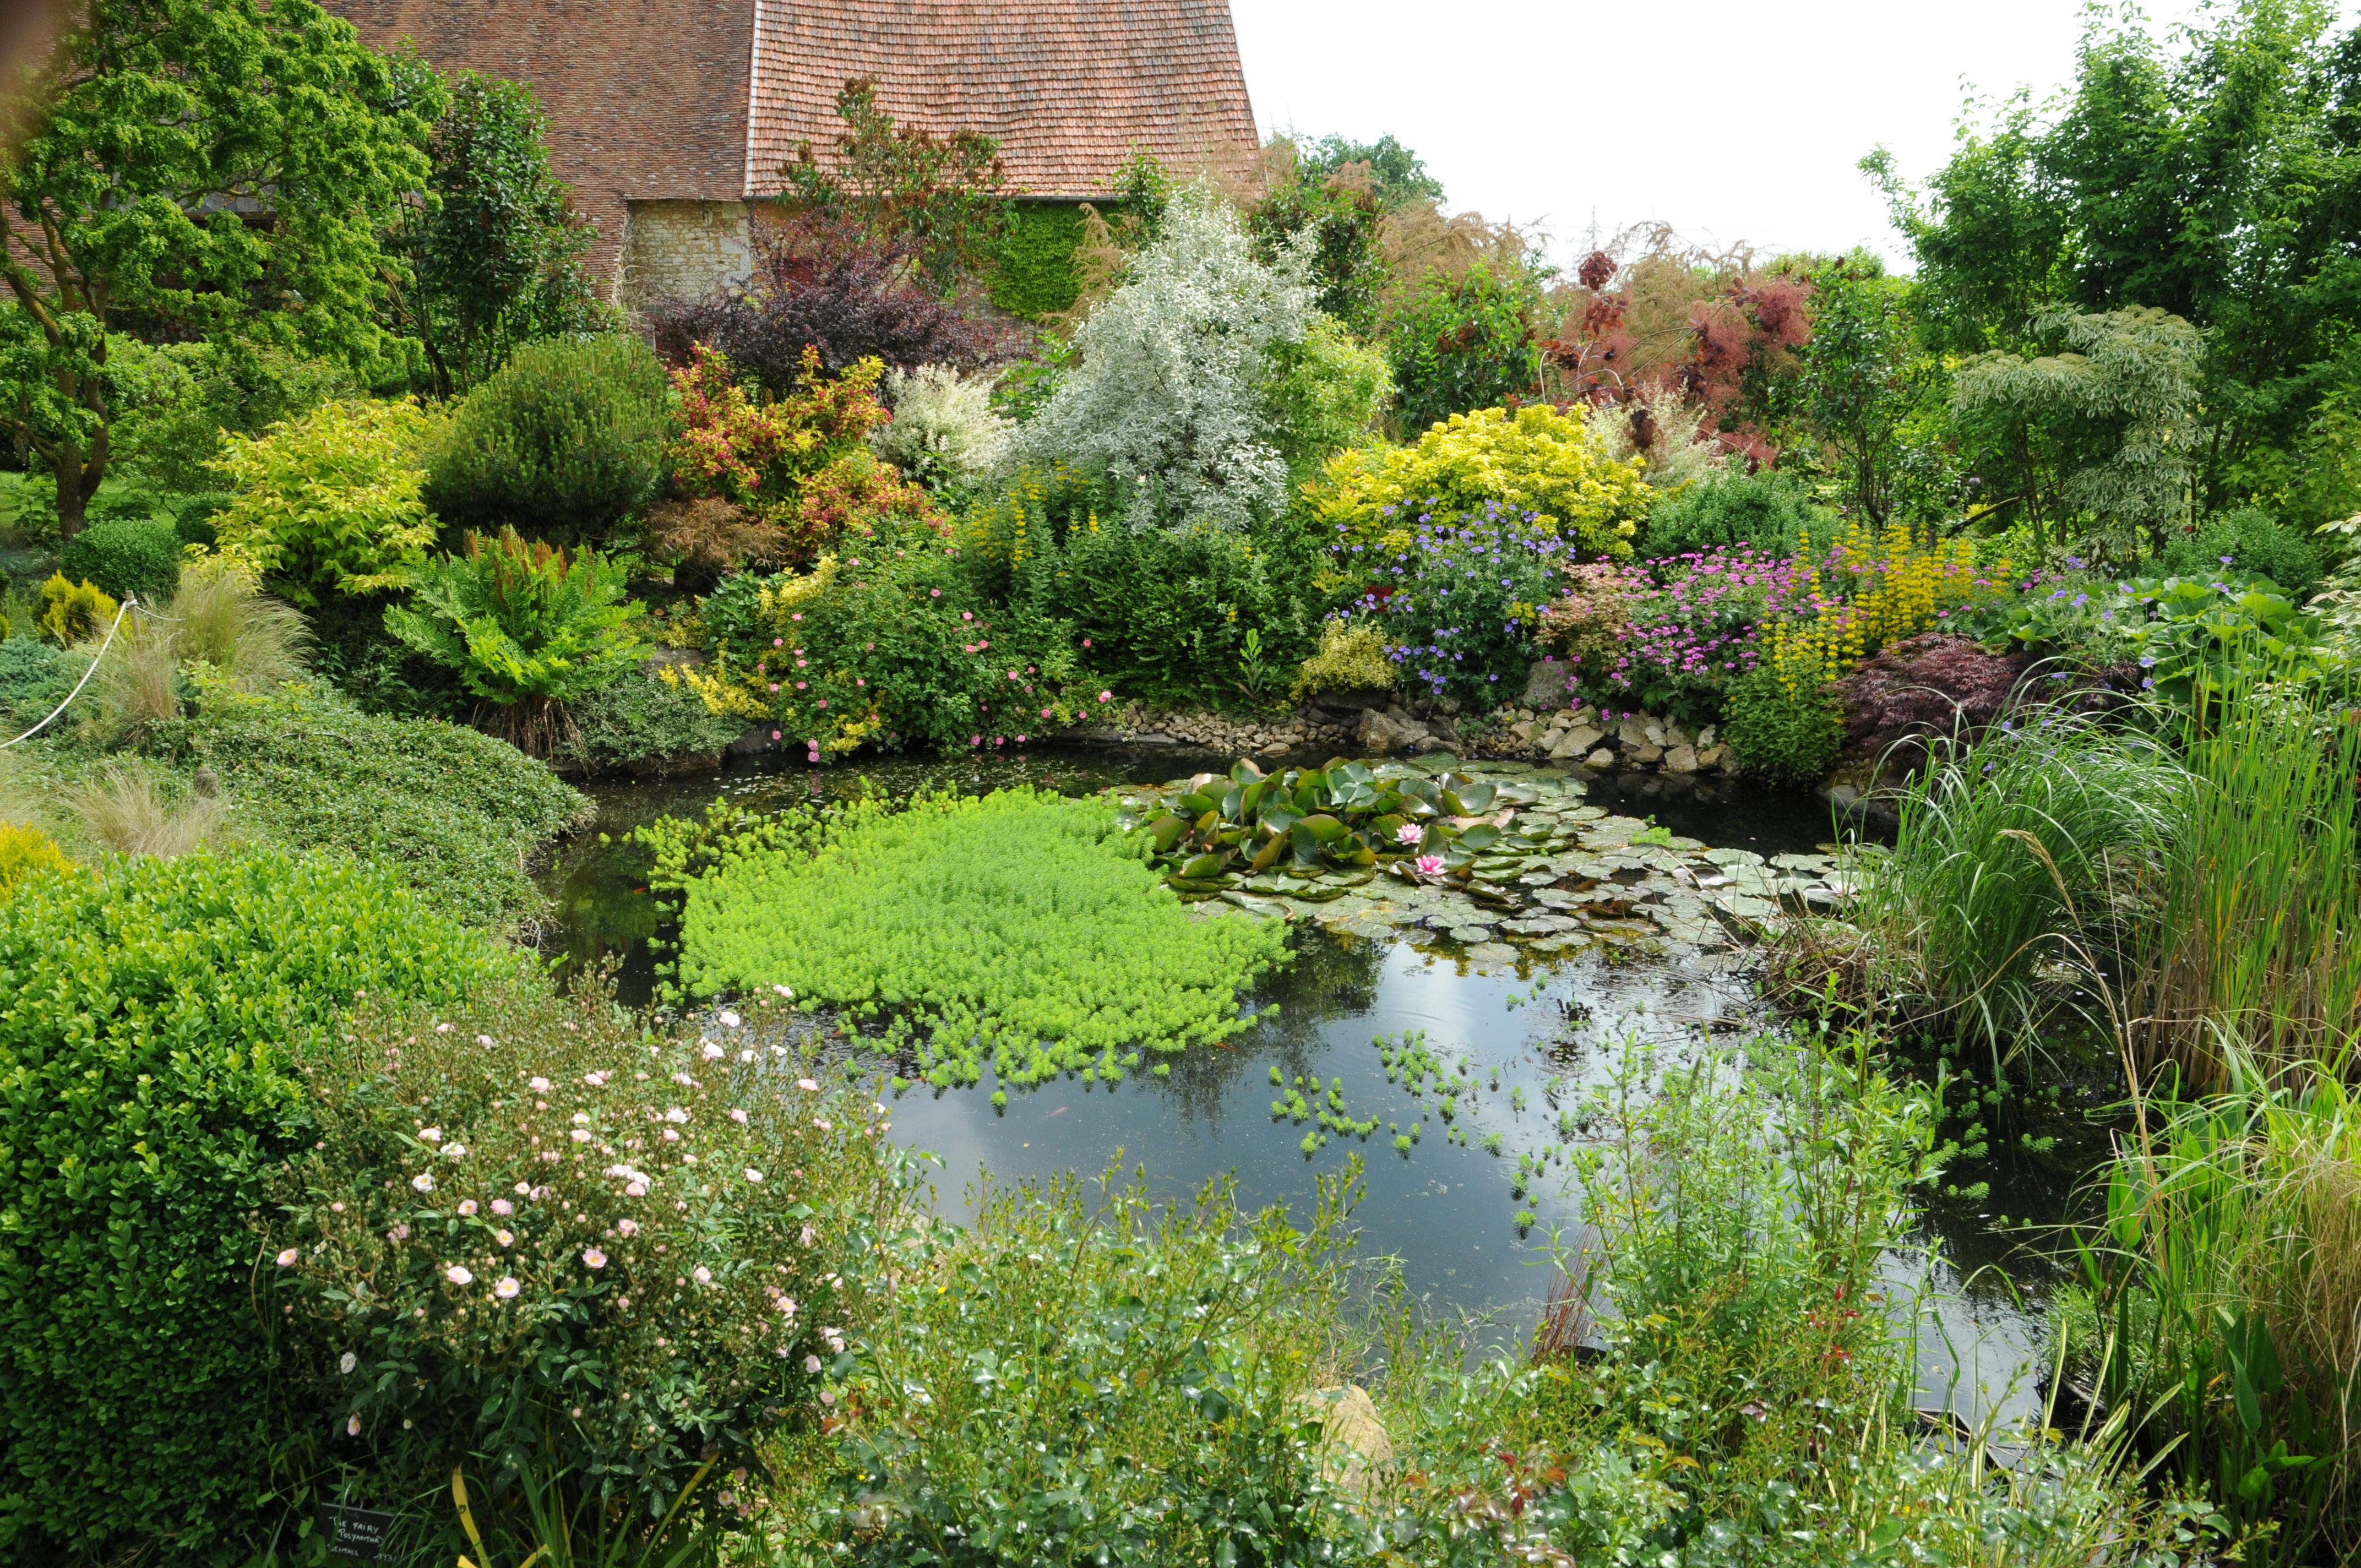 Jardin de Marie - Jardins secrets en berry - adtt 18 - Valentin Laebens